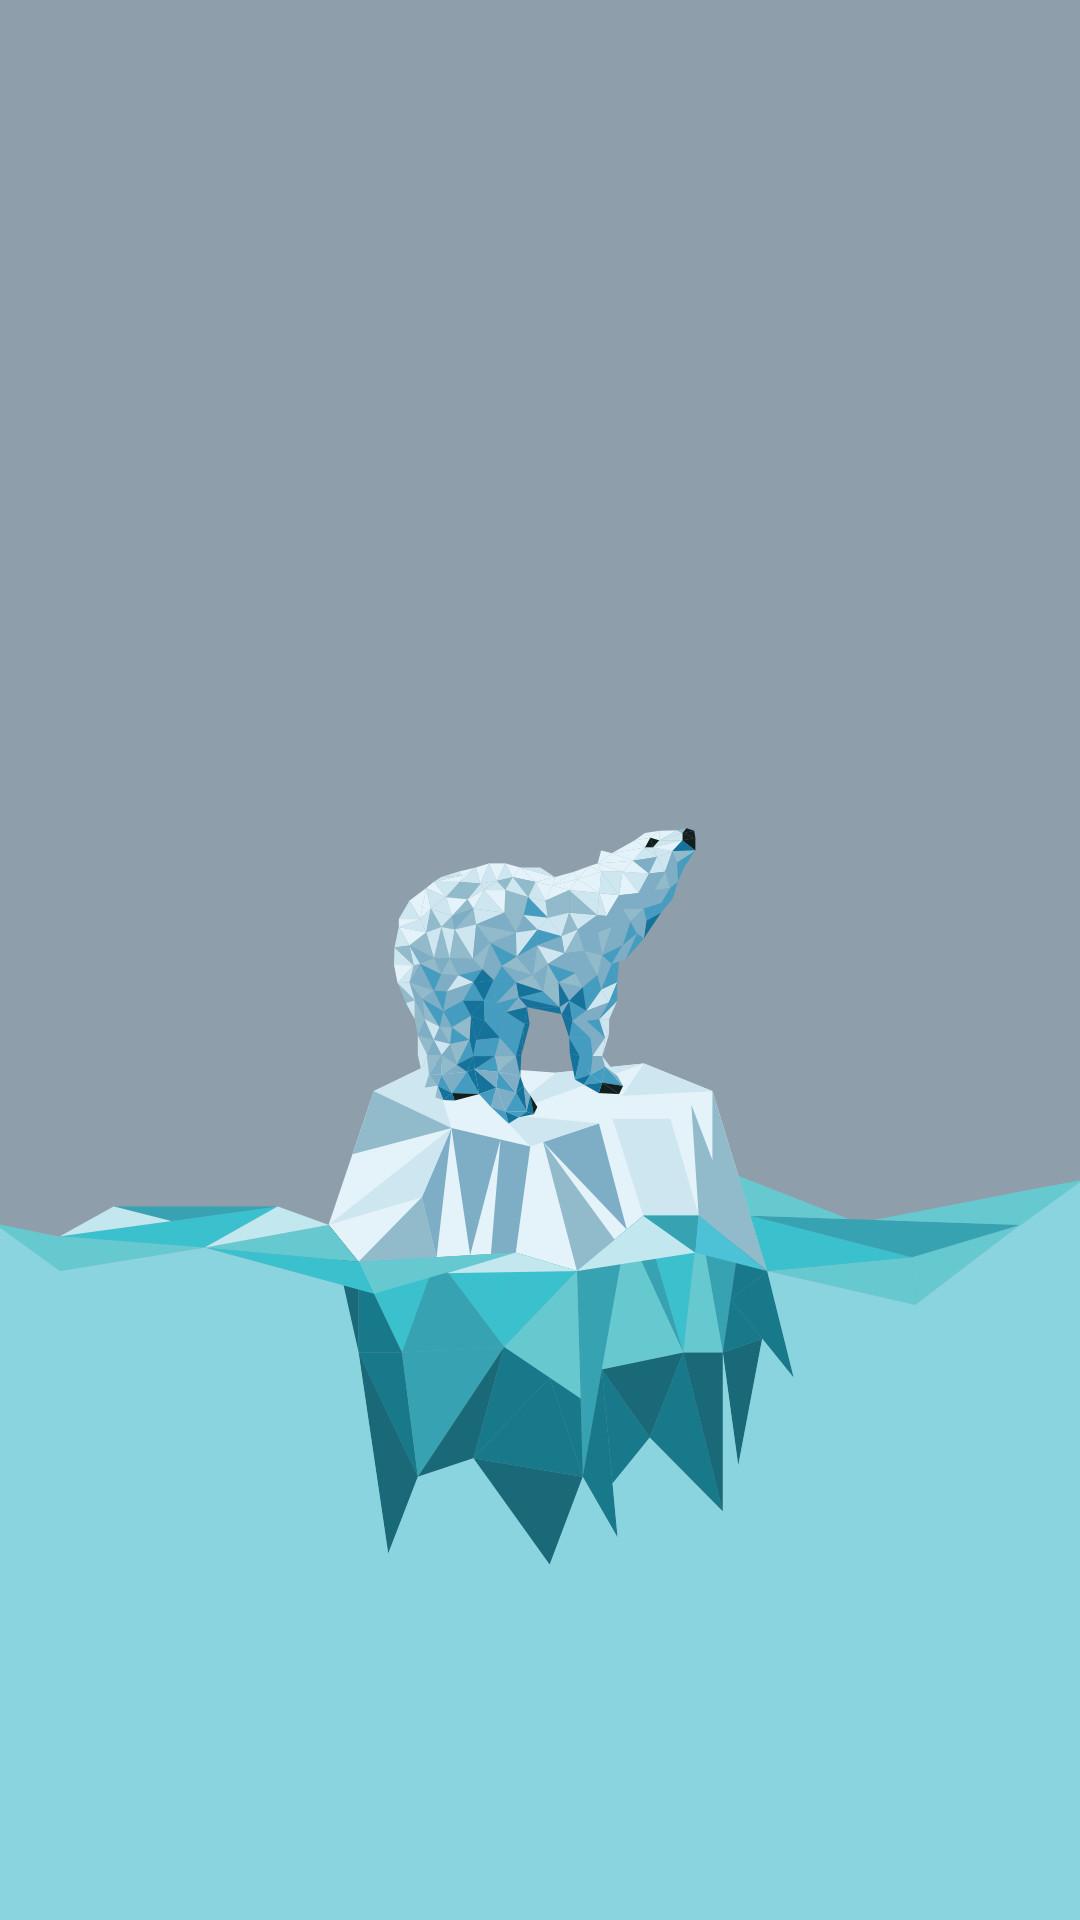 Res: 1080x1920, Minimal iPhone wallpaper ❤ polar bear